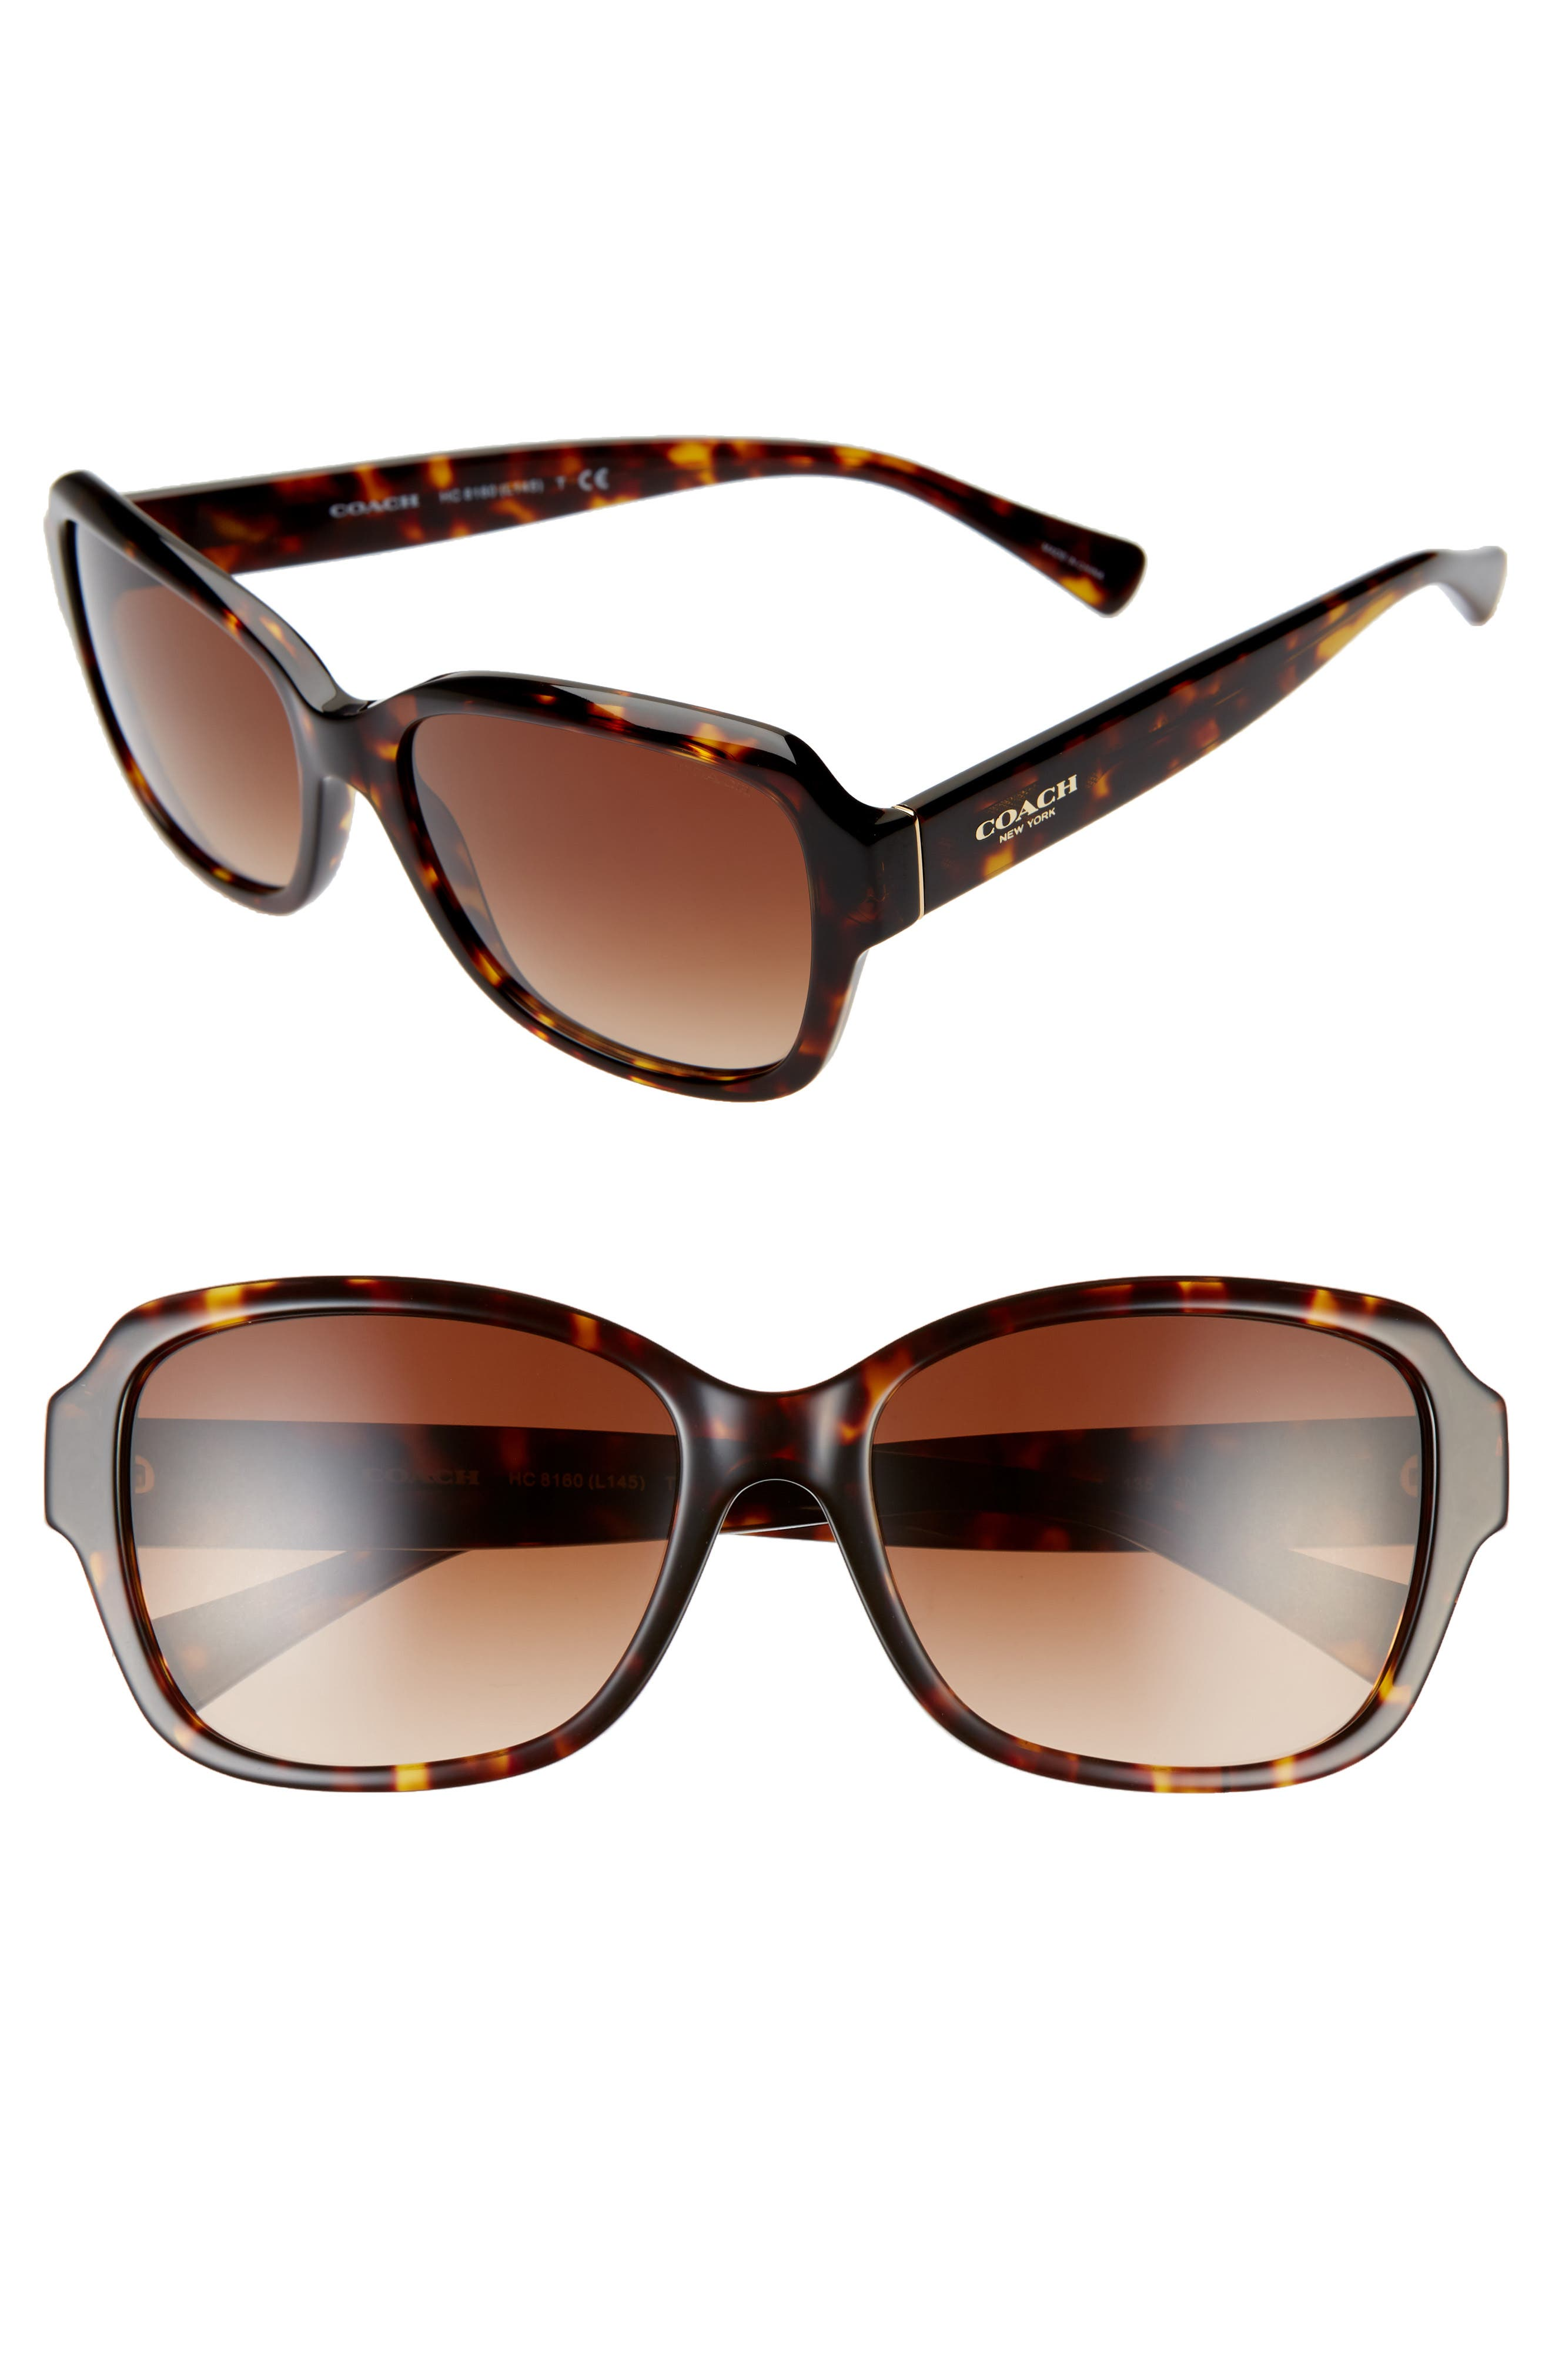 45379025535c6 COACH Sunglasses for Women